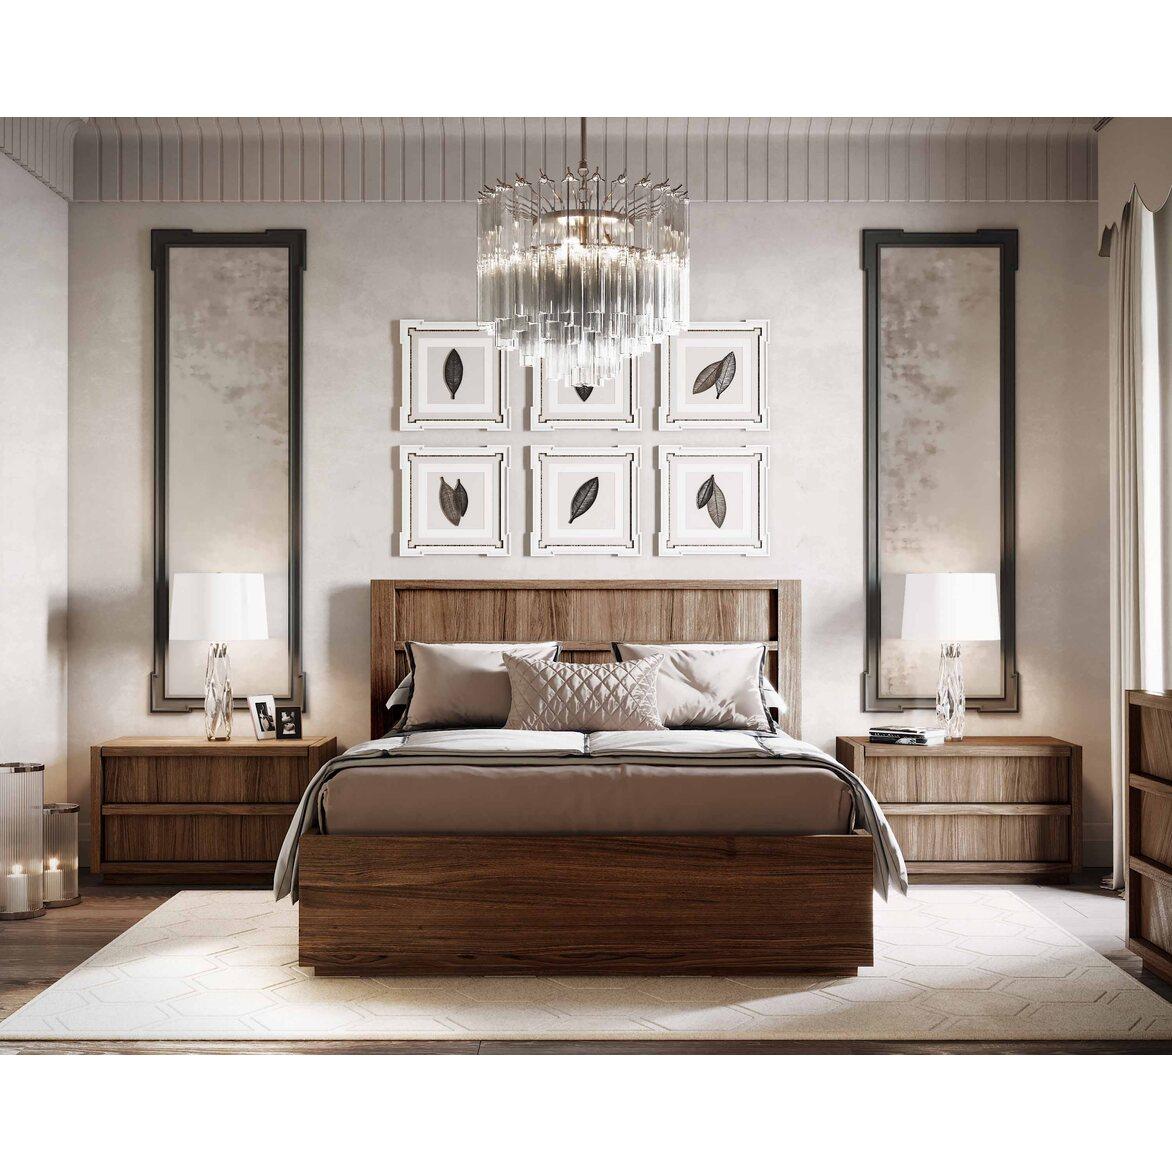 "Кровать 160*200 ""Brenson"" 3 | Двуспальные кровати Kingsby"